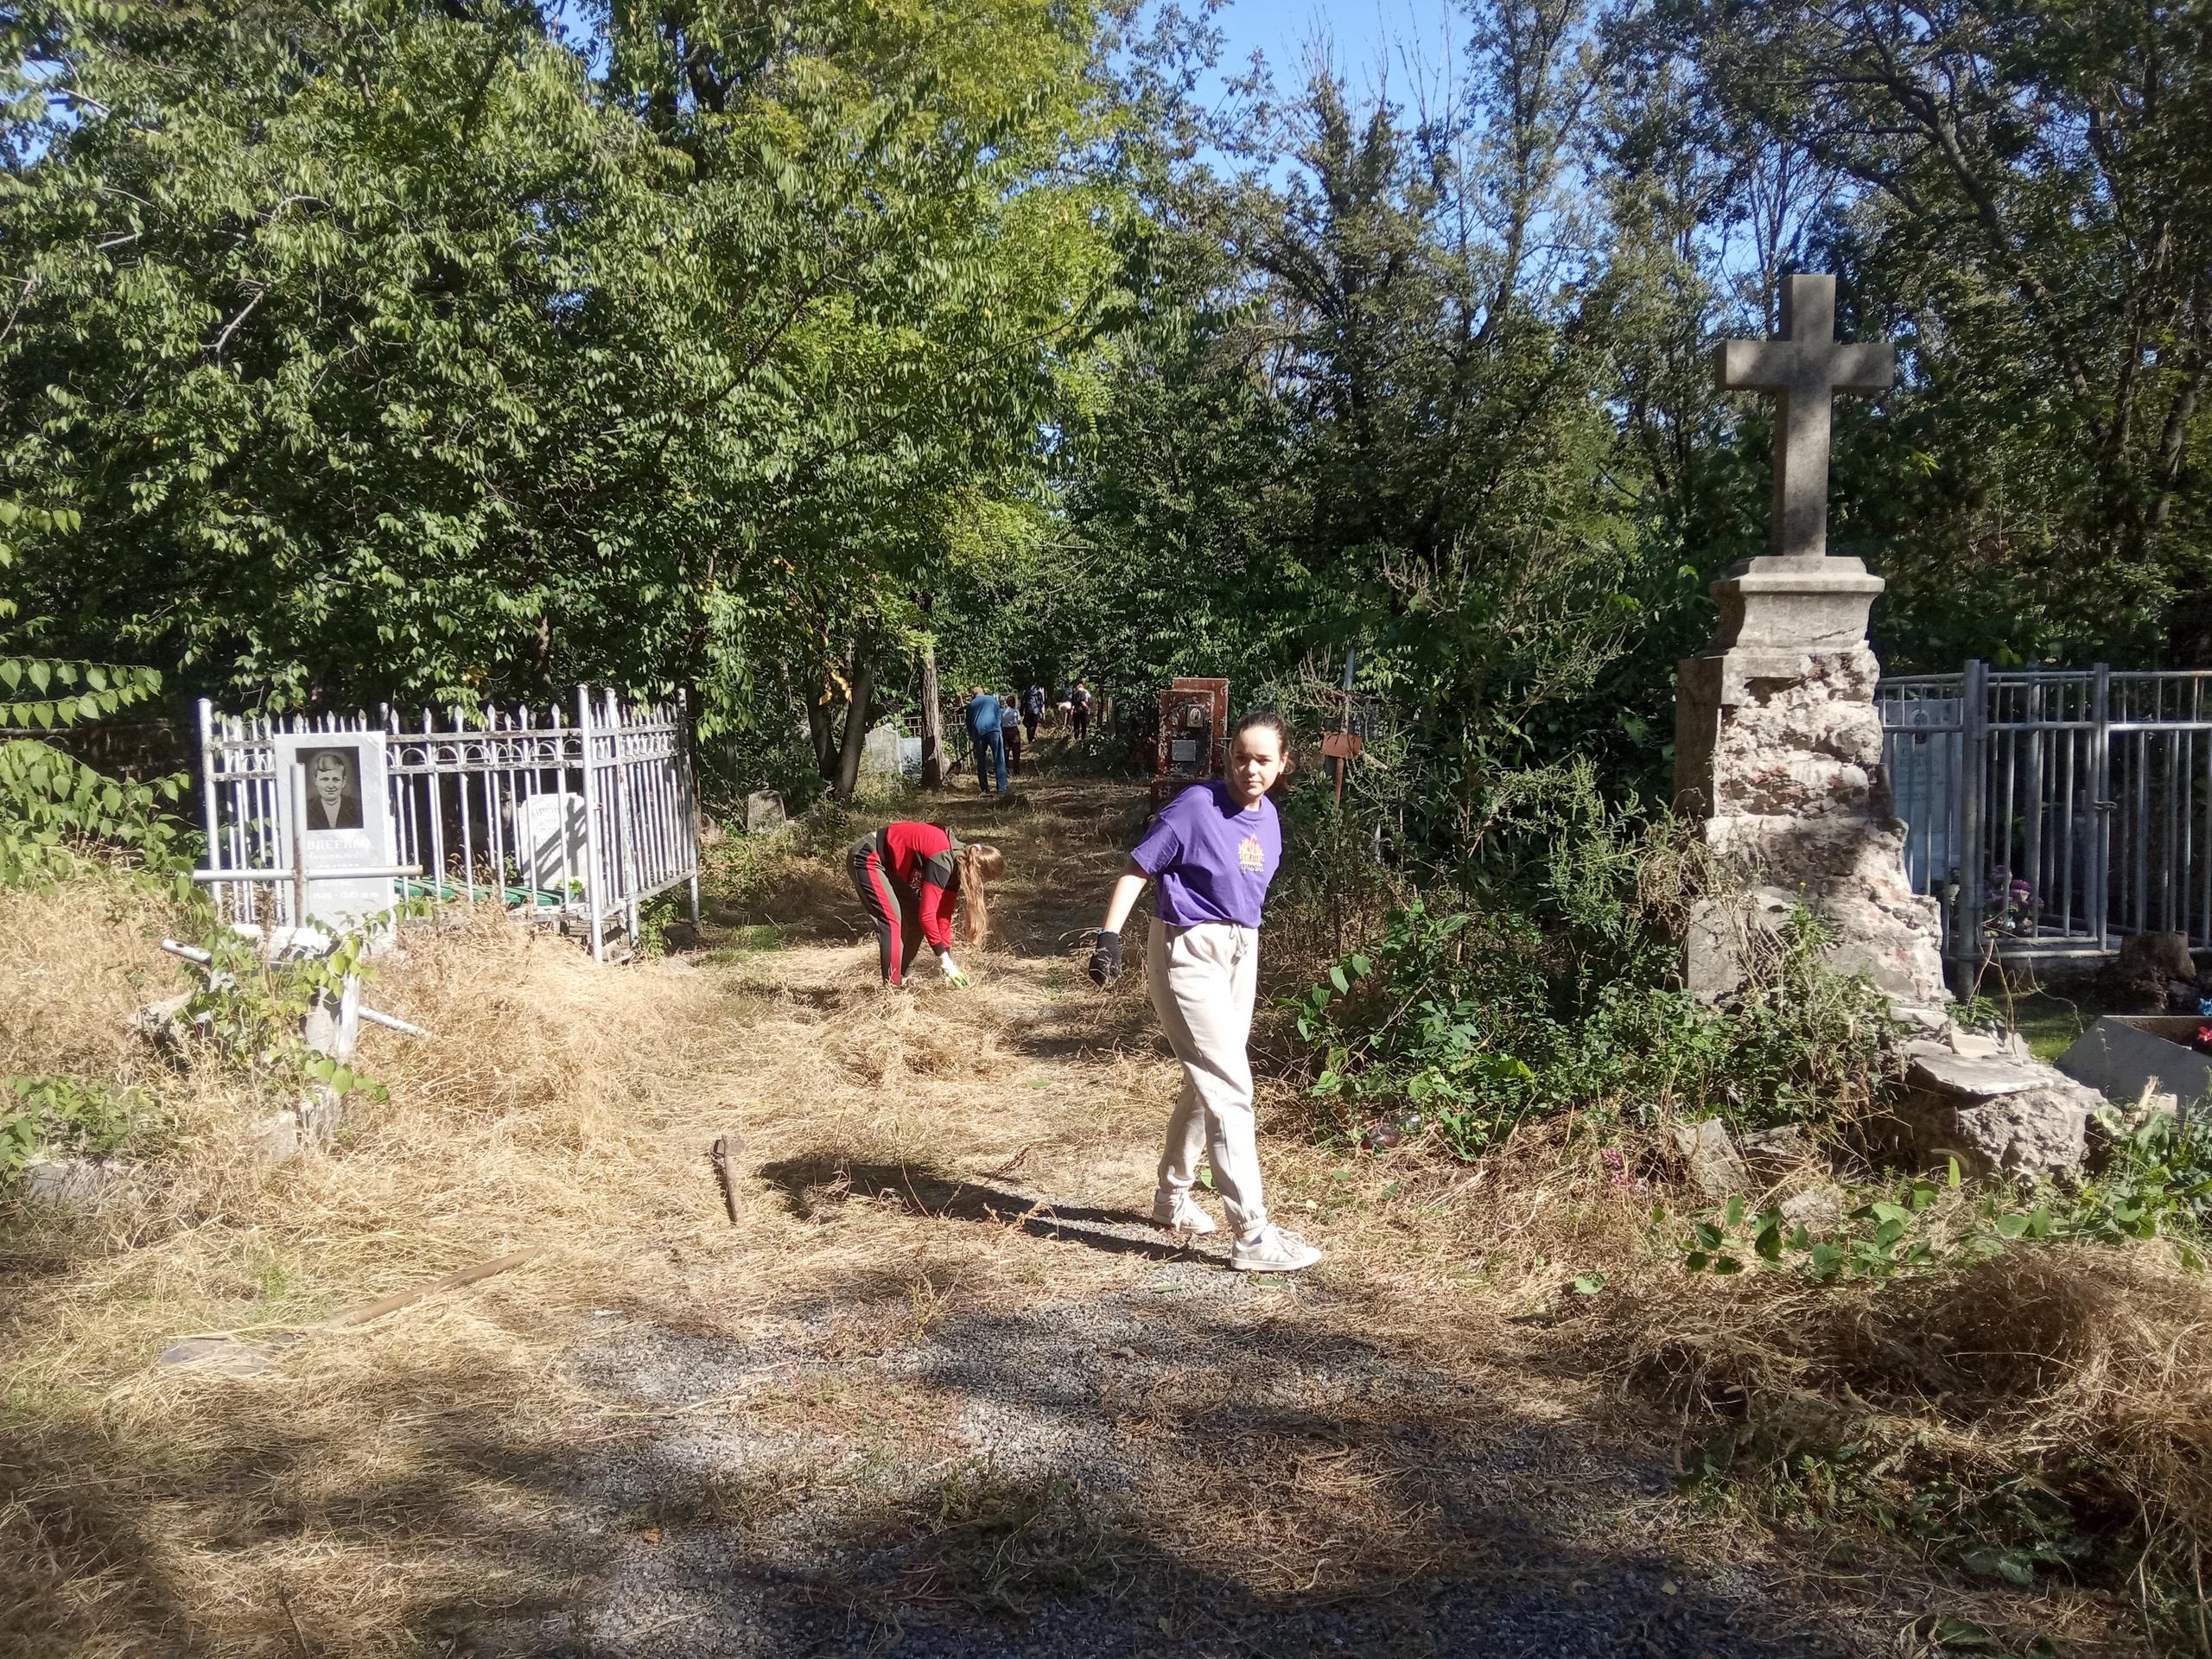 Таганрог, старое кладбище, субботник 2021, волонтеры культуры